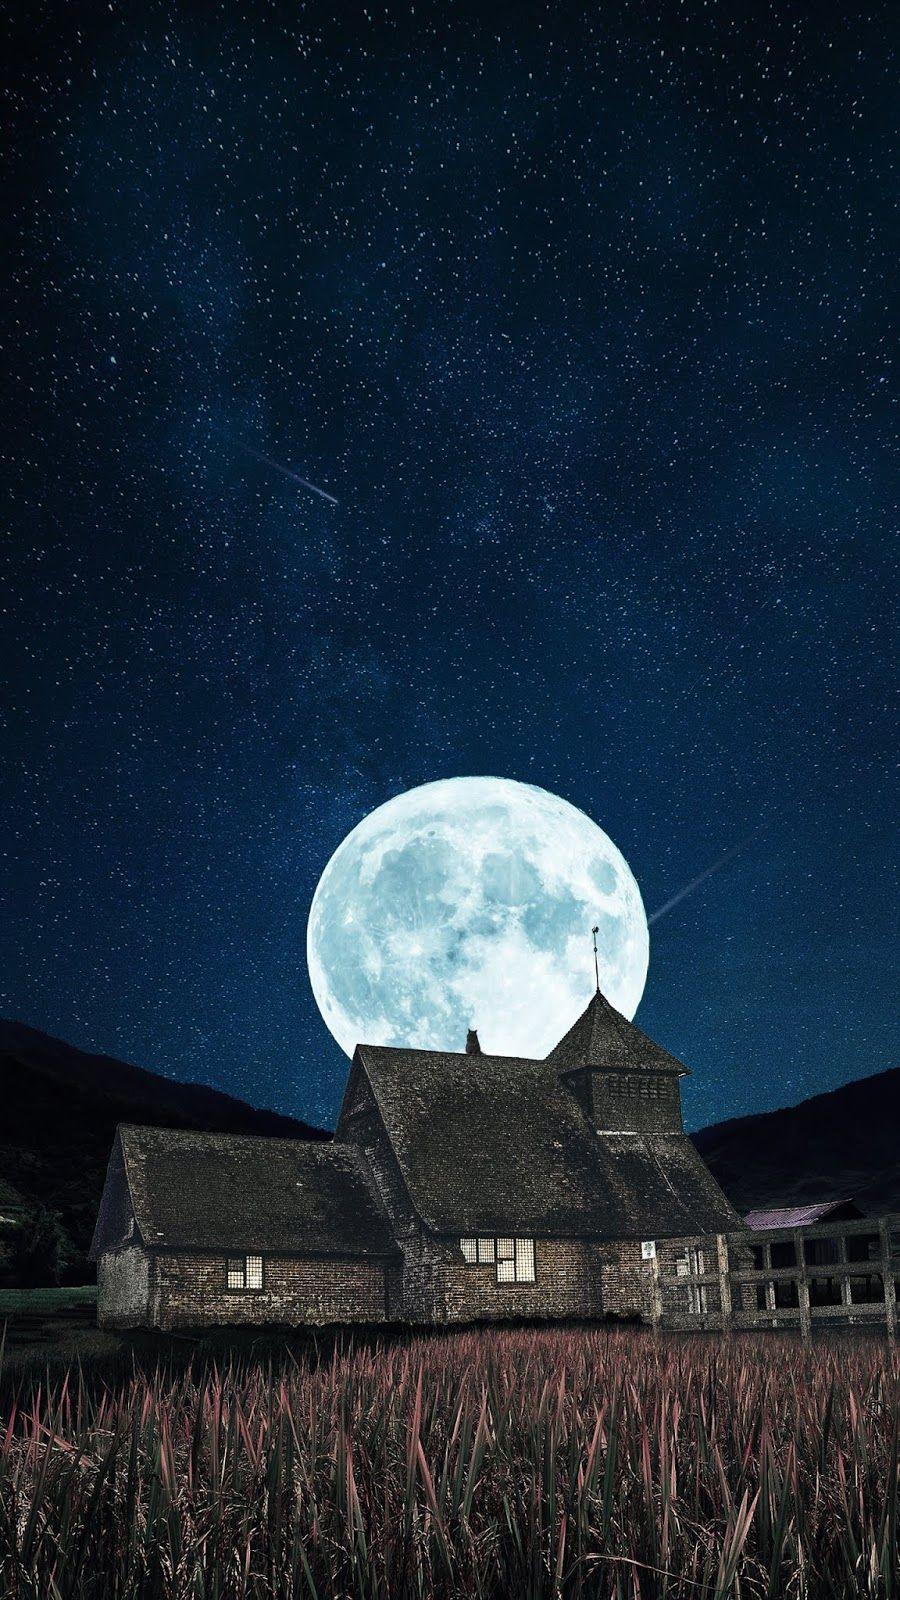 Full moon in the night Glam wallpaper, Trippy wallpaper